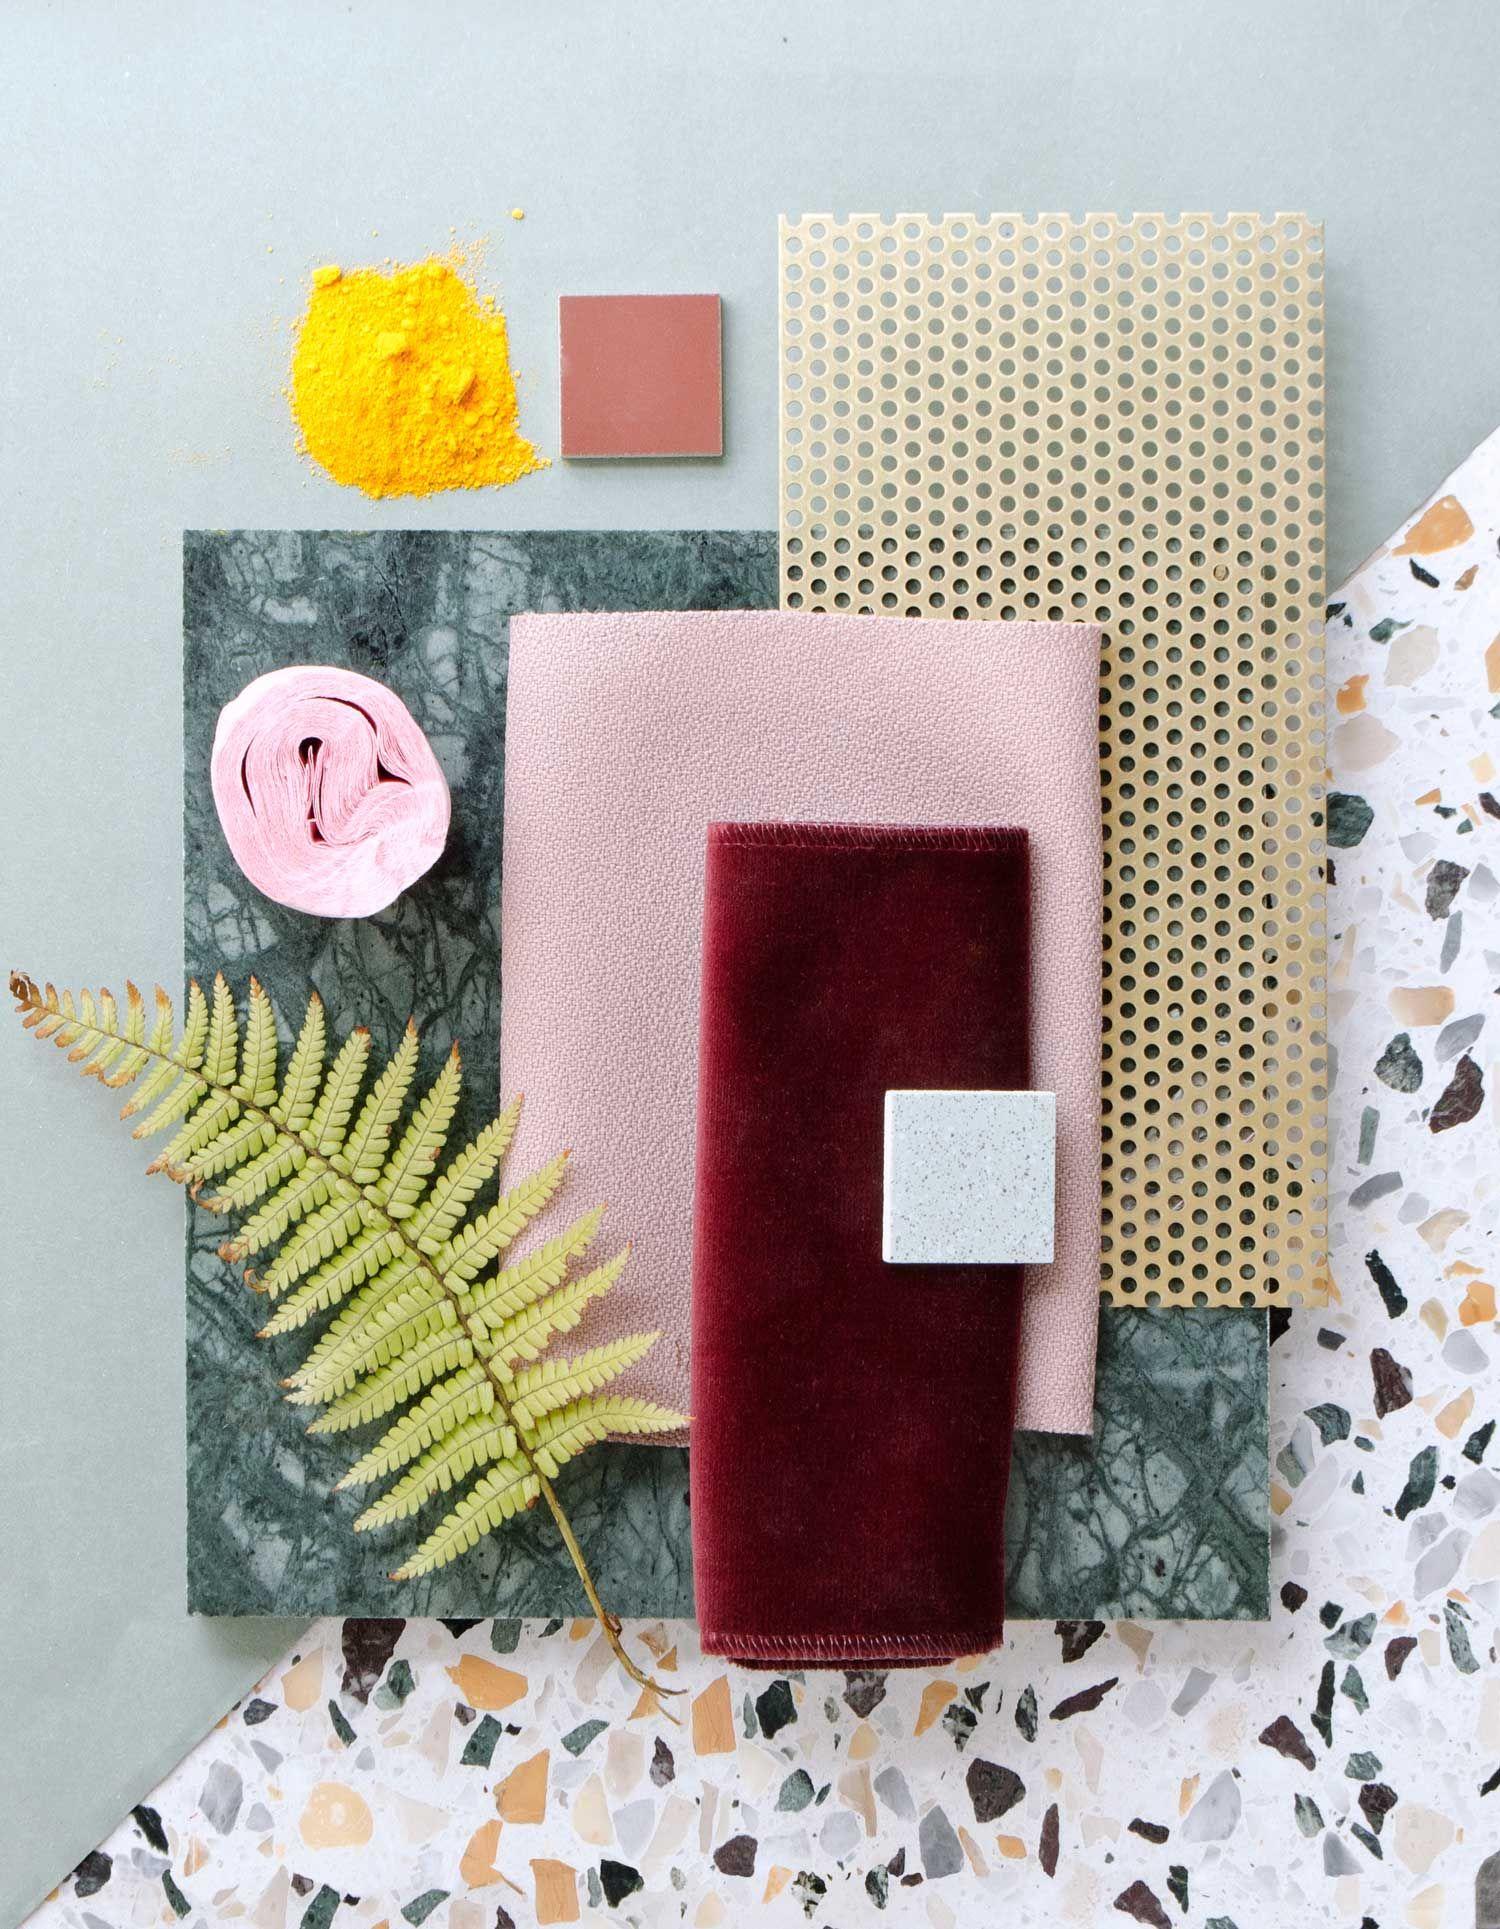 Materials By Studio David Thulstrup